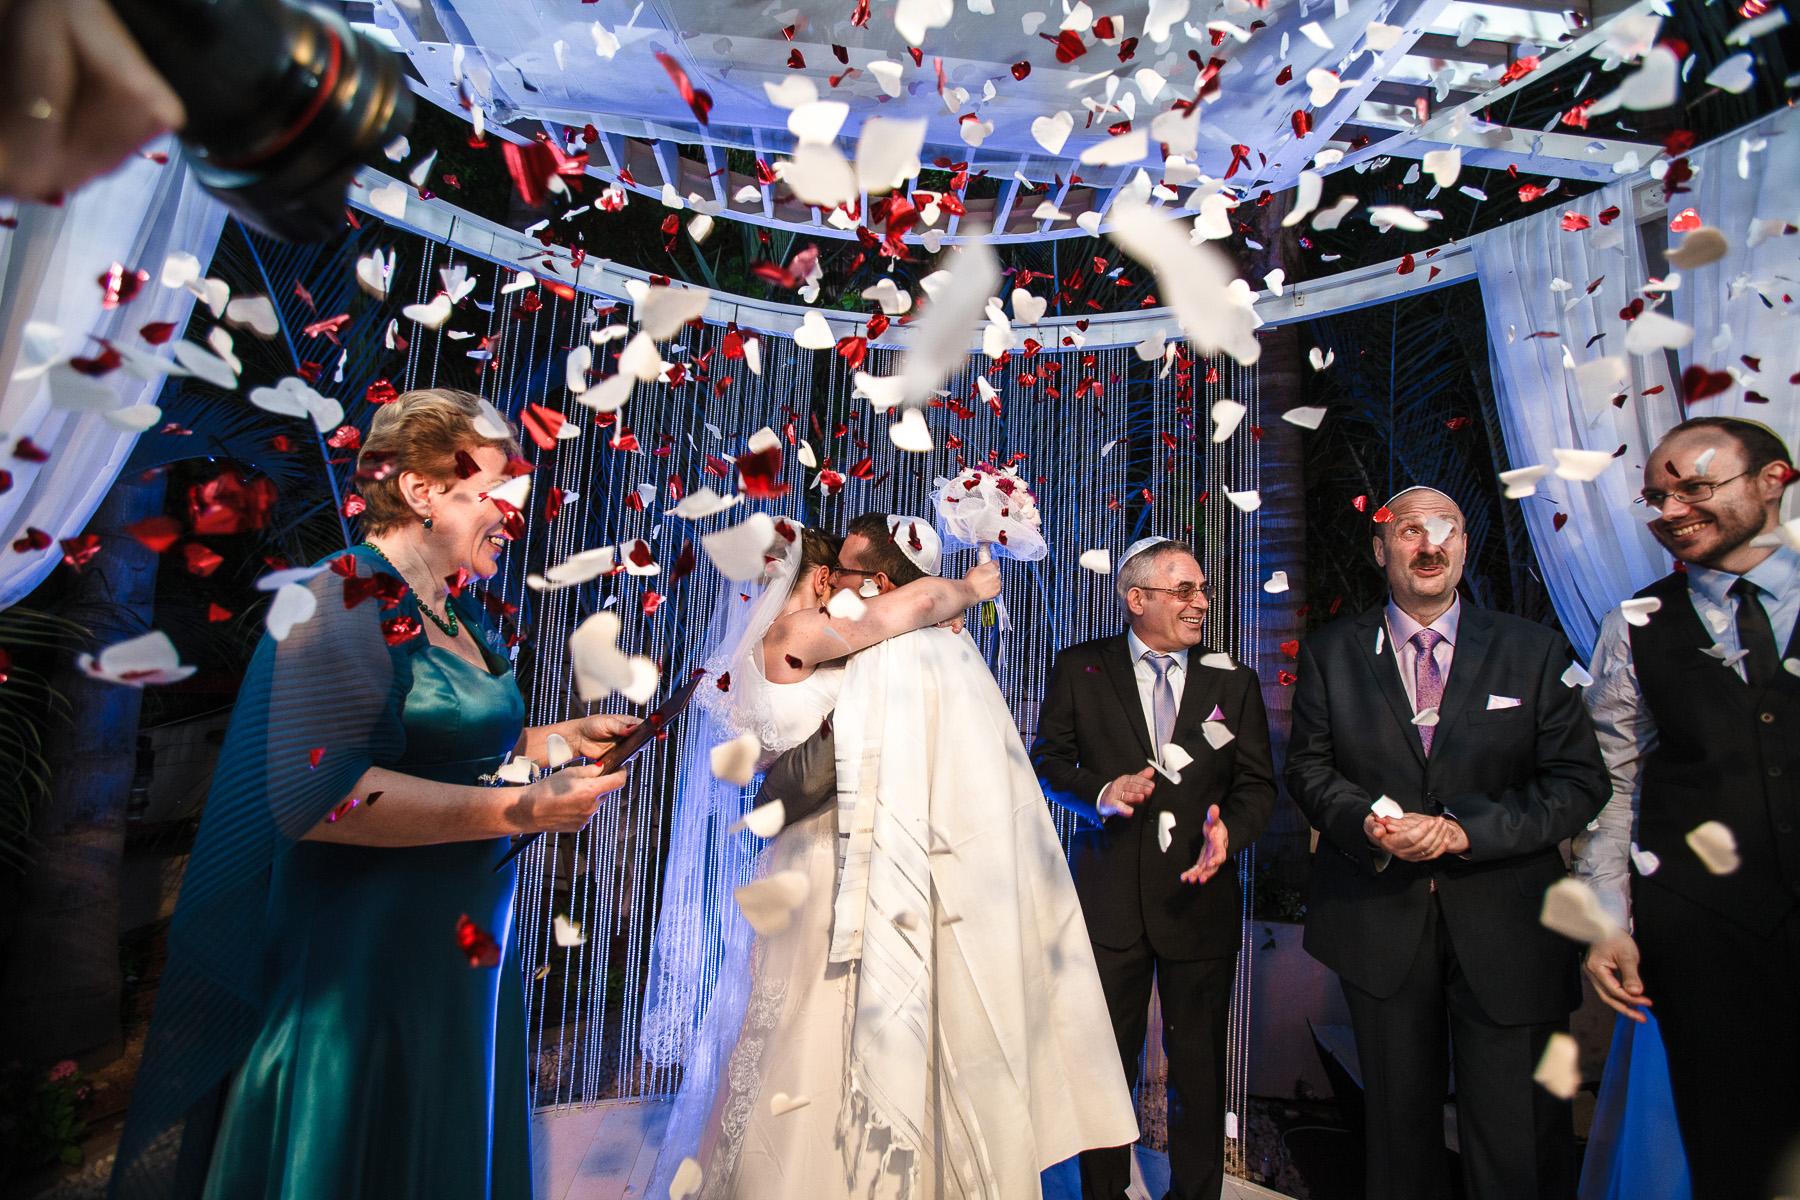 Maria&Michael wedding_0571_filtered.jpg